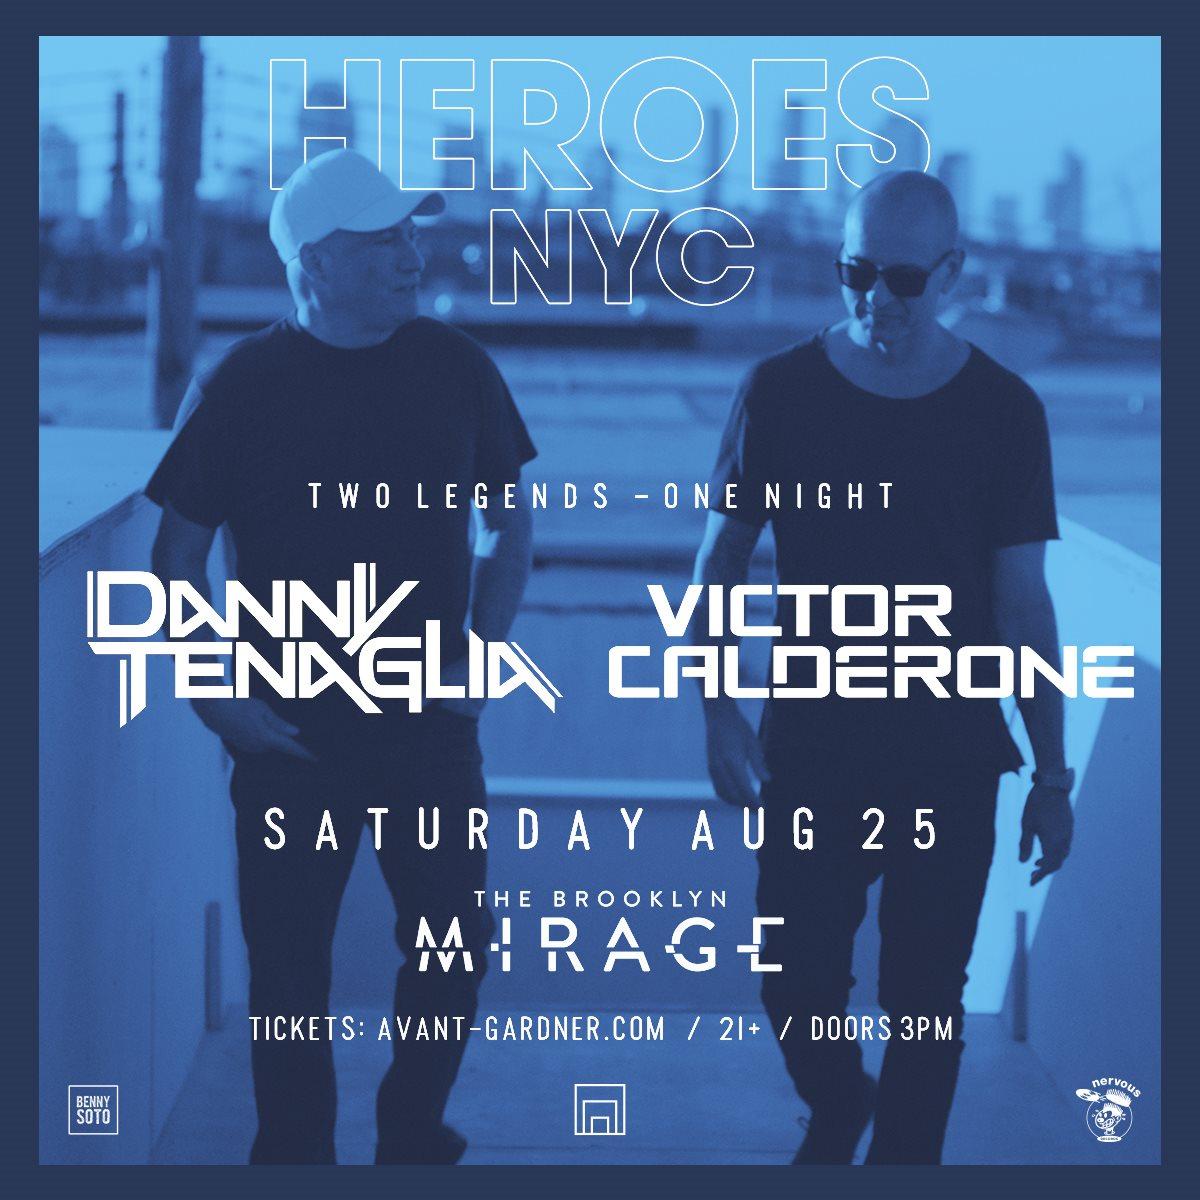 danny tenaglia victor calderone the brooklyn mirage robbie lumpkin promotions